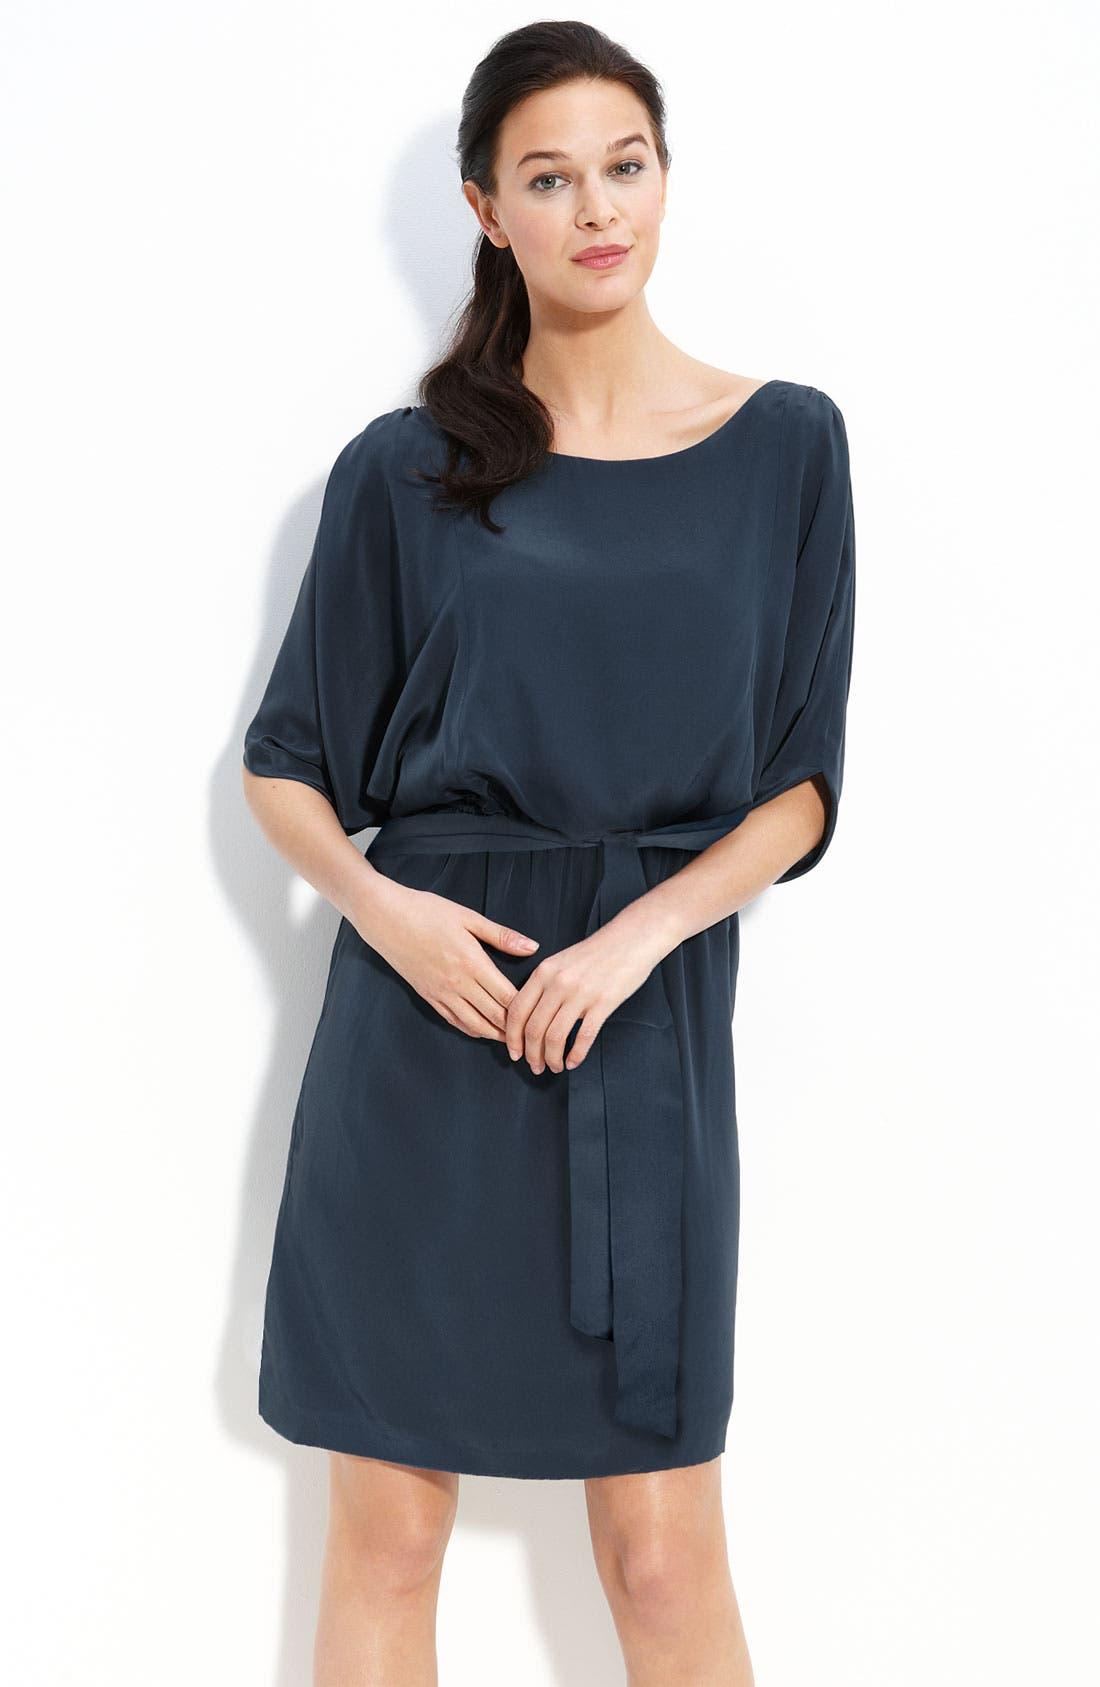 Main Image - Suzi Chin for Maggy Boutique Silk Blouson Dress